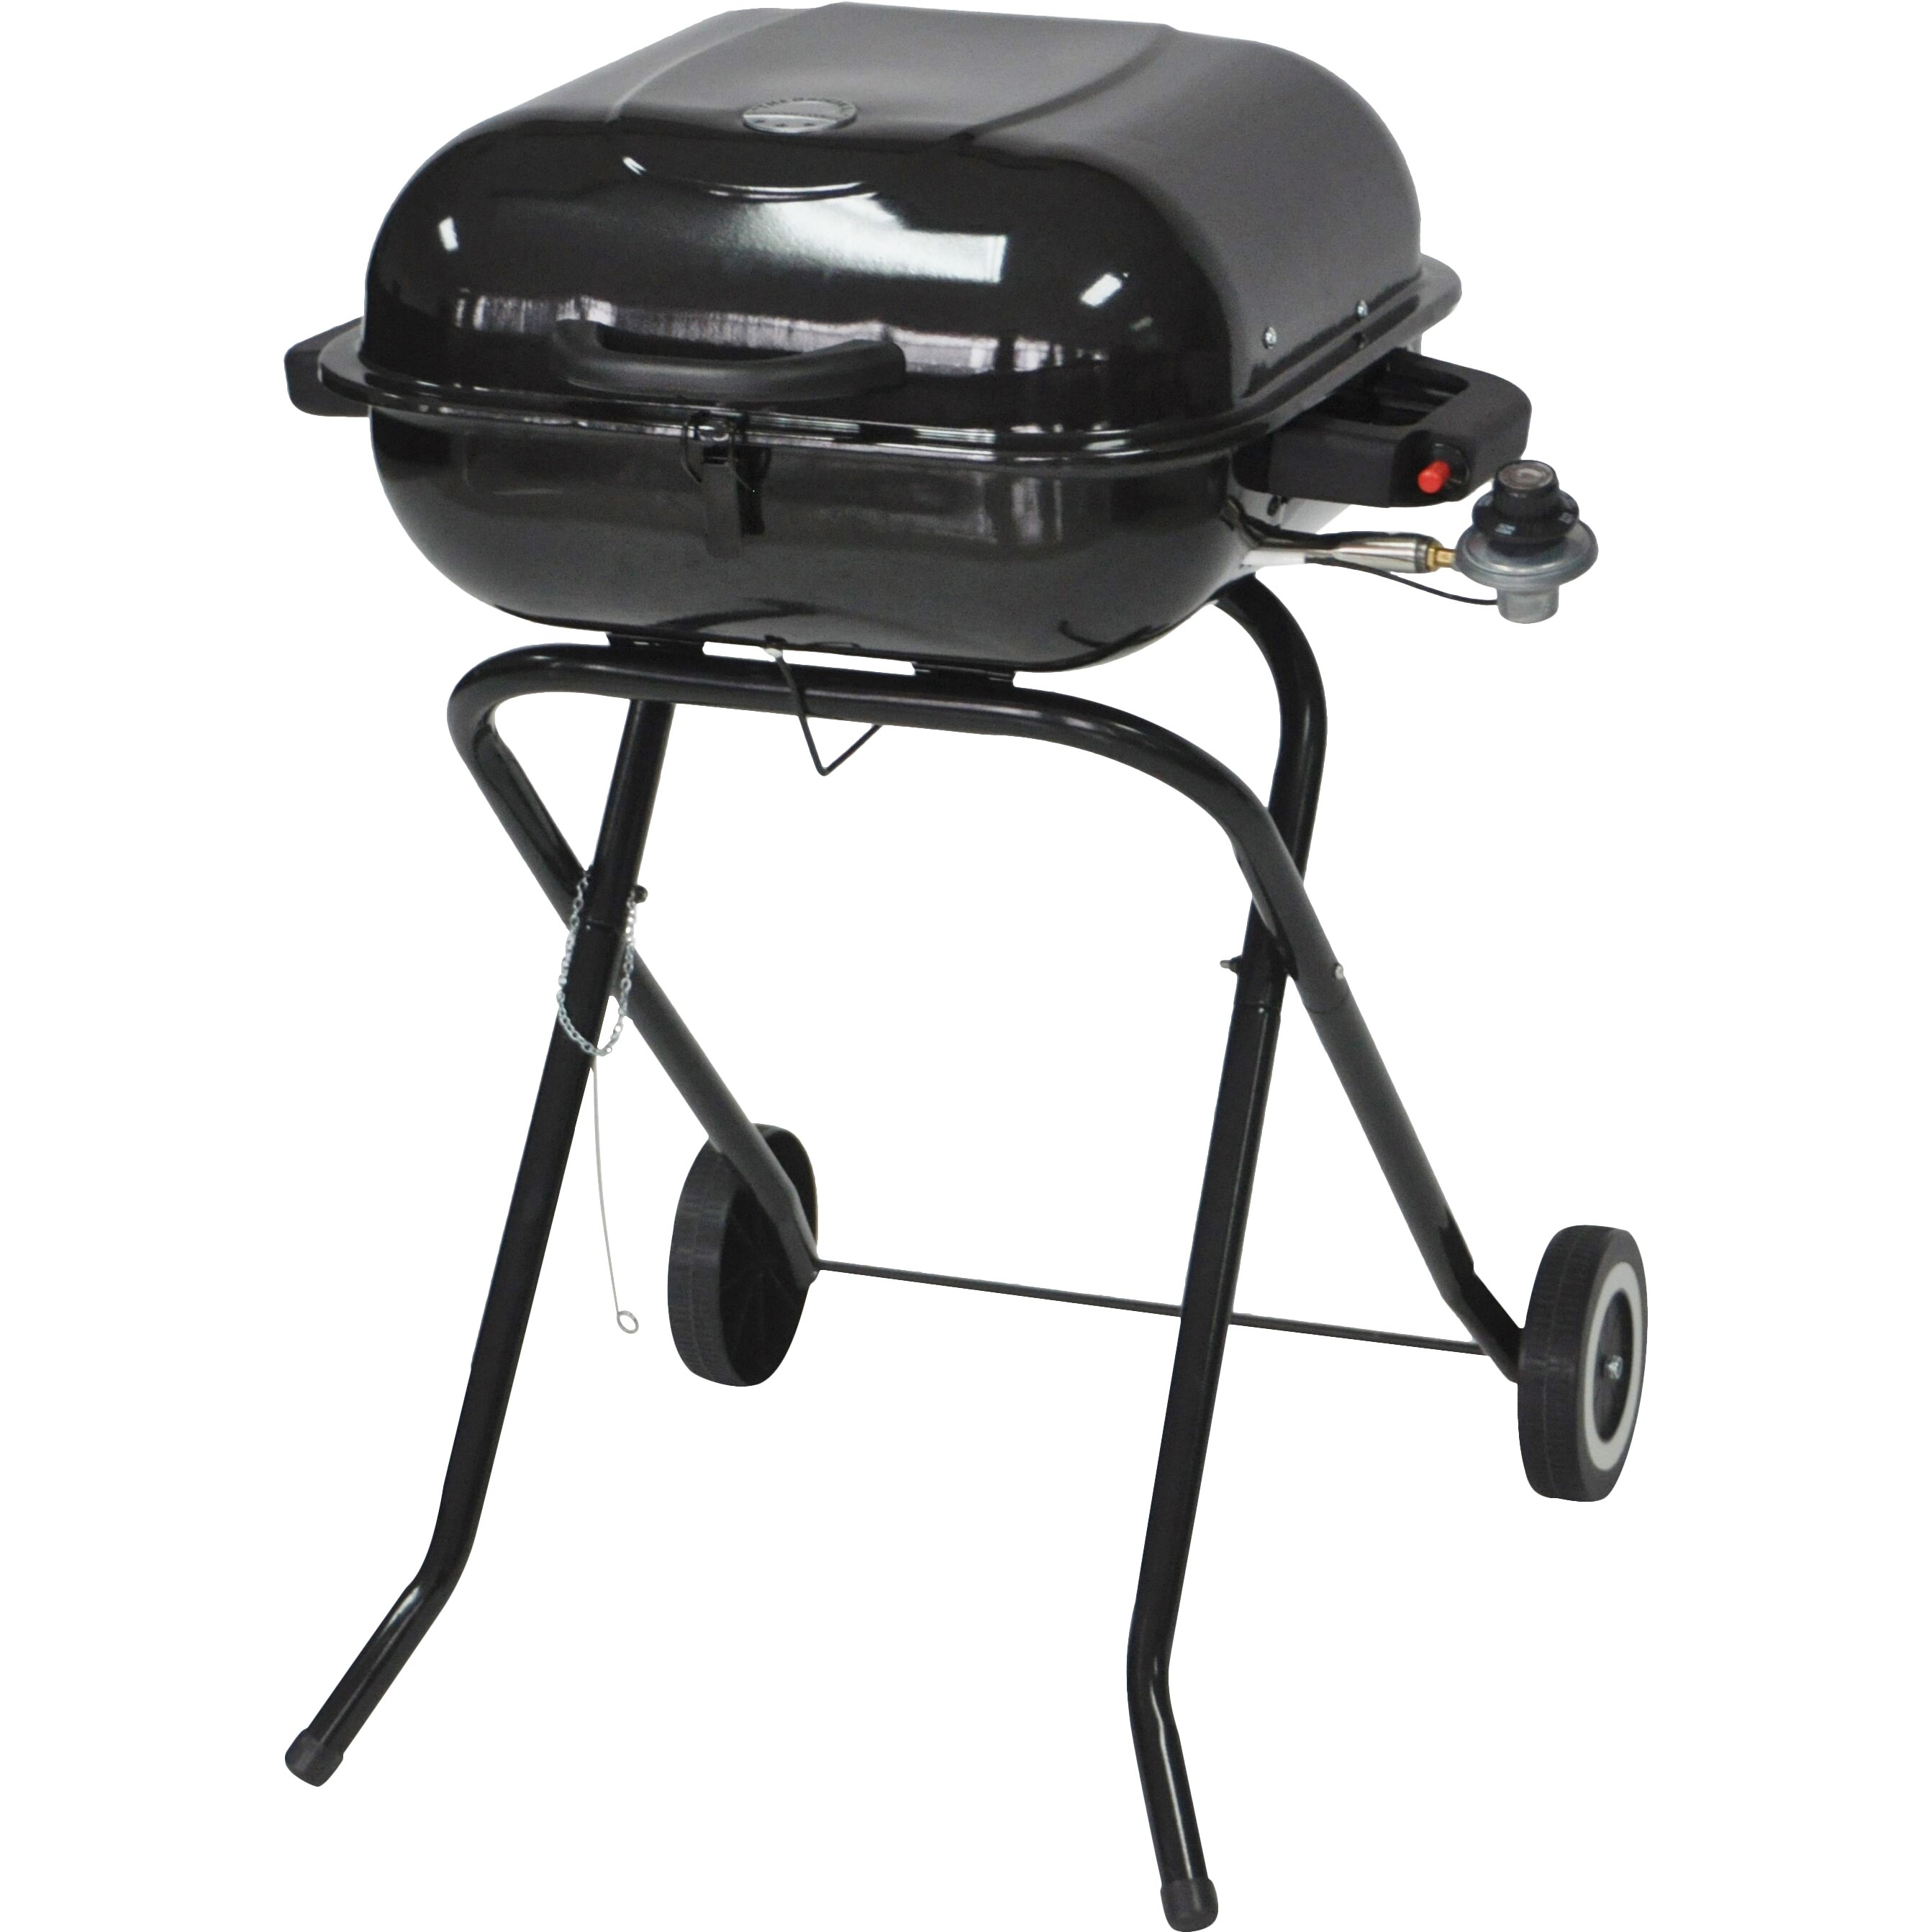 The Original Outdoor Cooker 18 5 Quot Portable Propane Gas